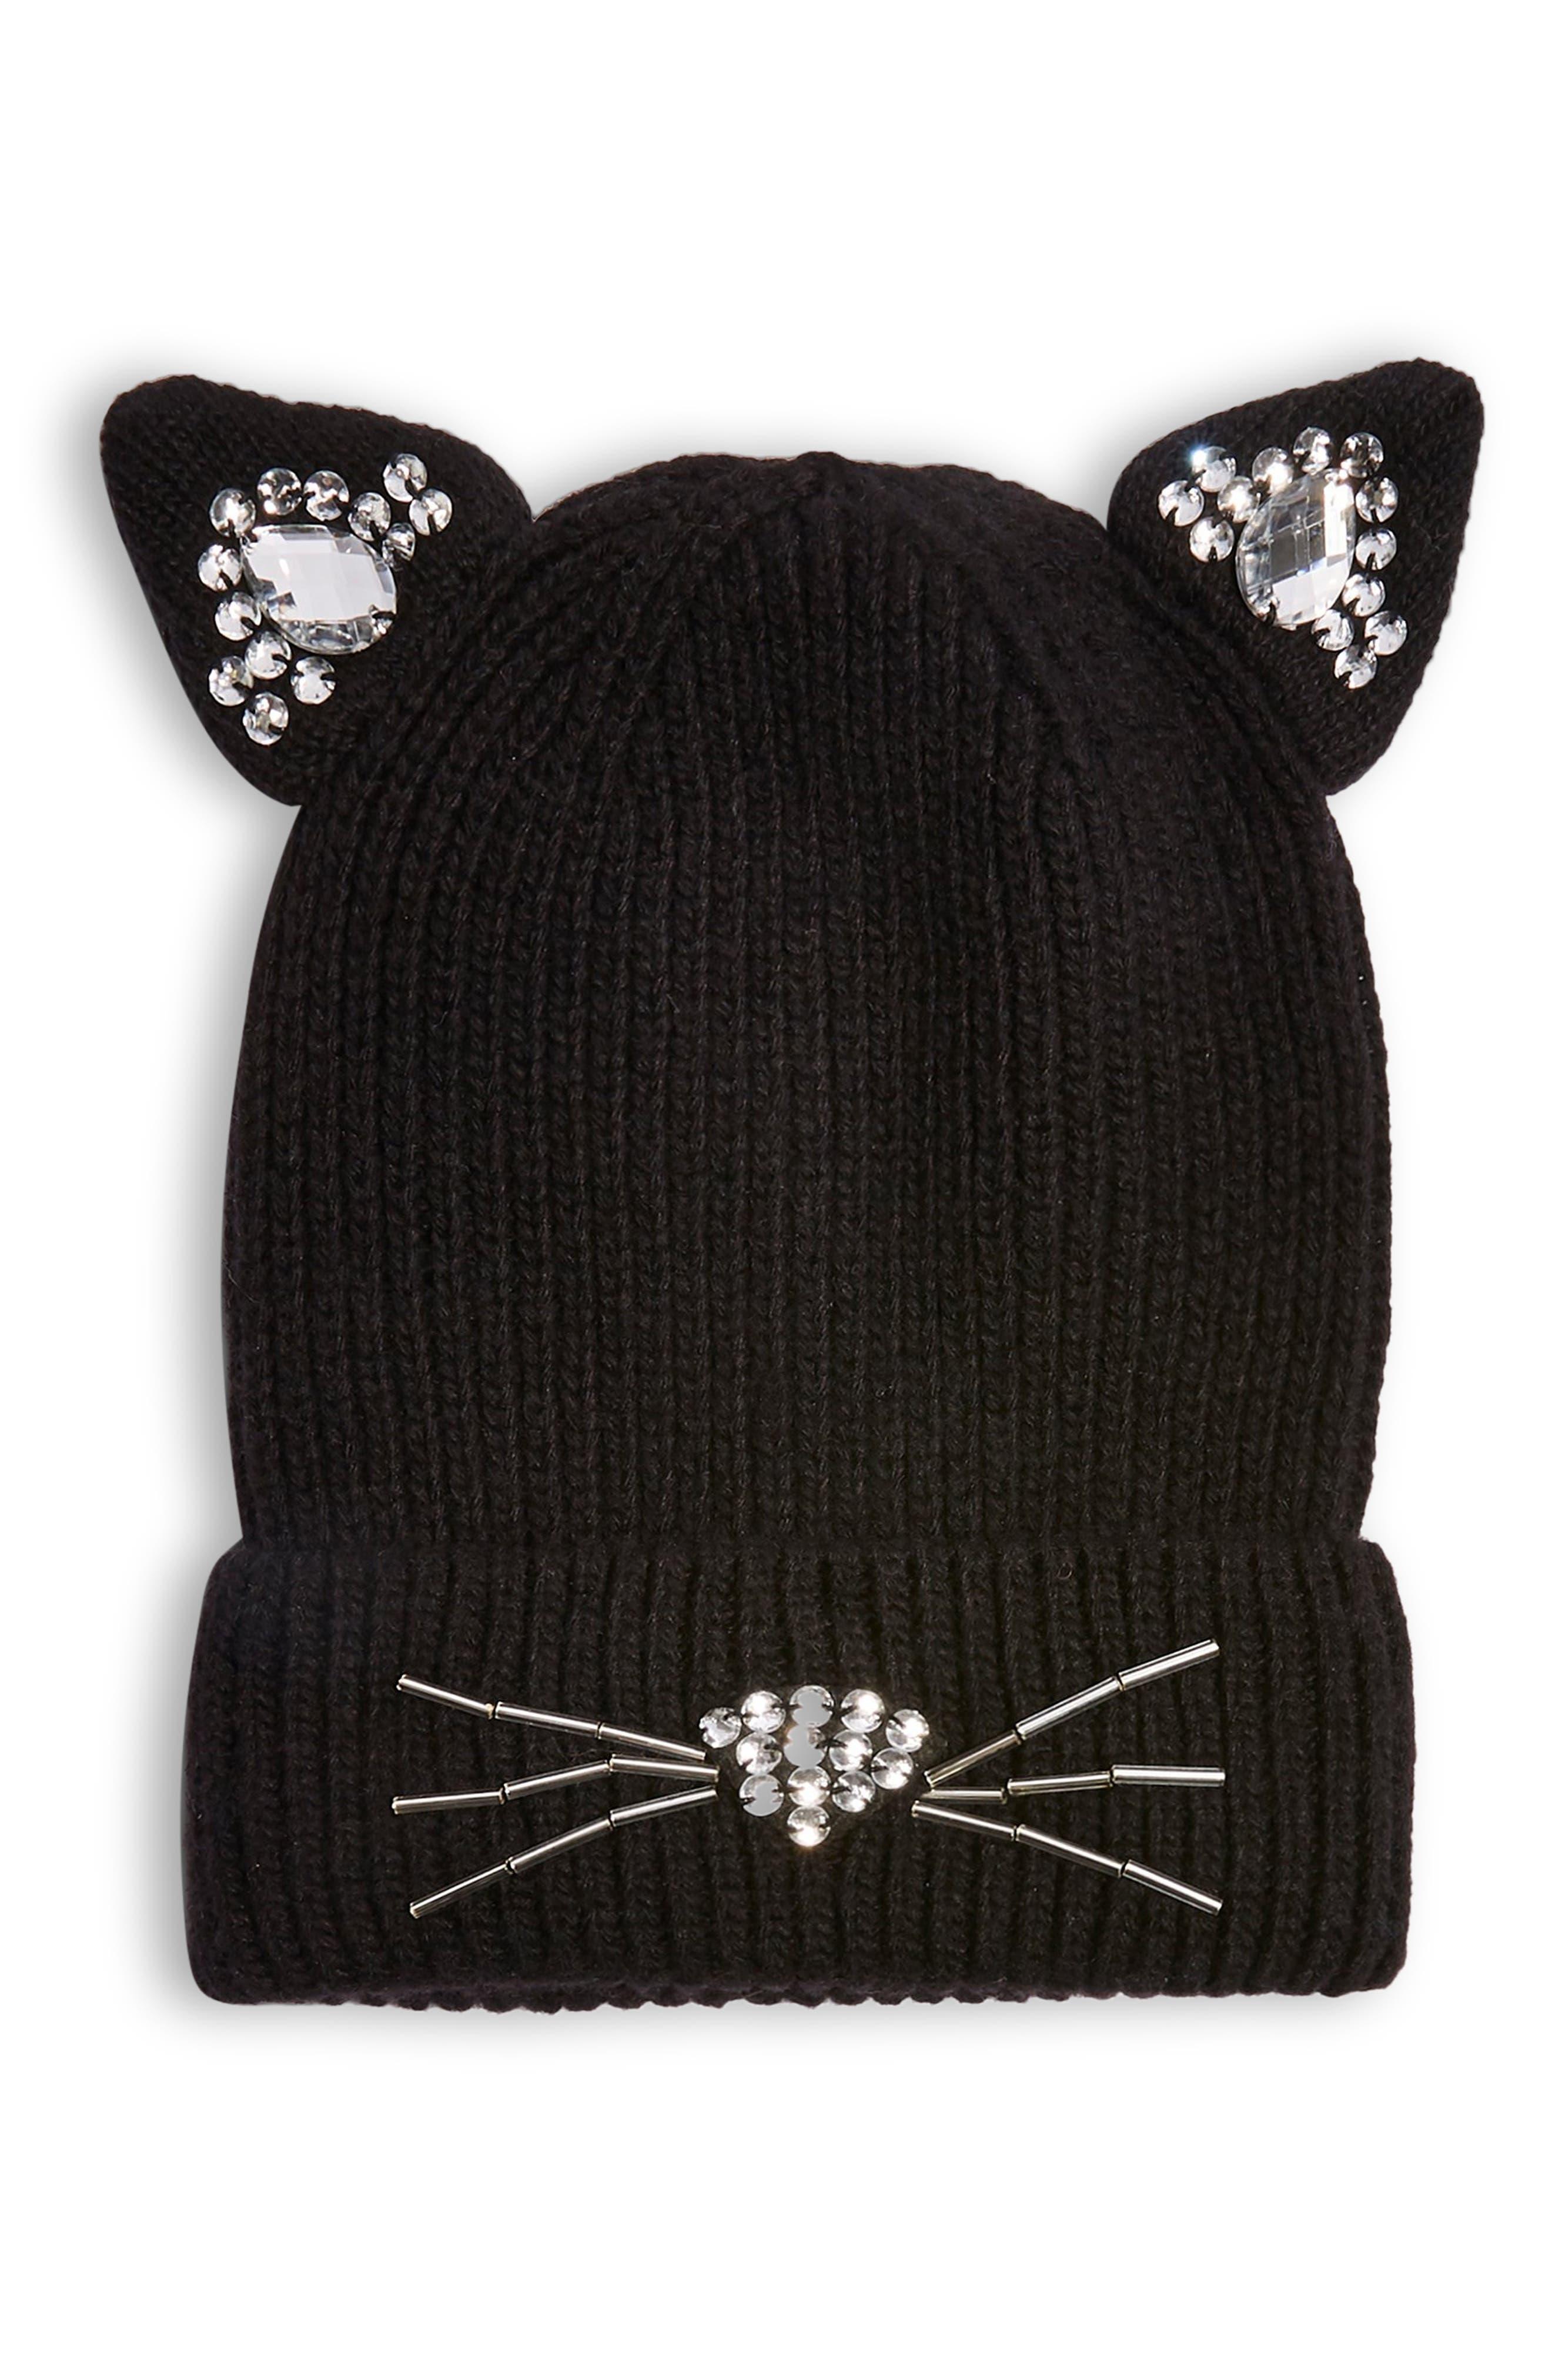 Cat Embellished Beanie,                         Main,                         color, BLACK